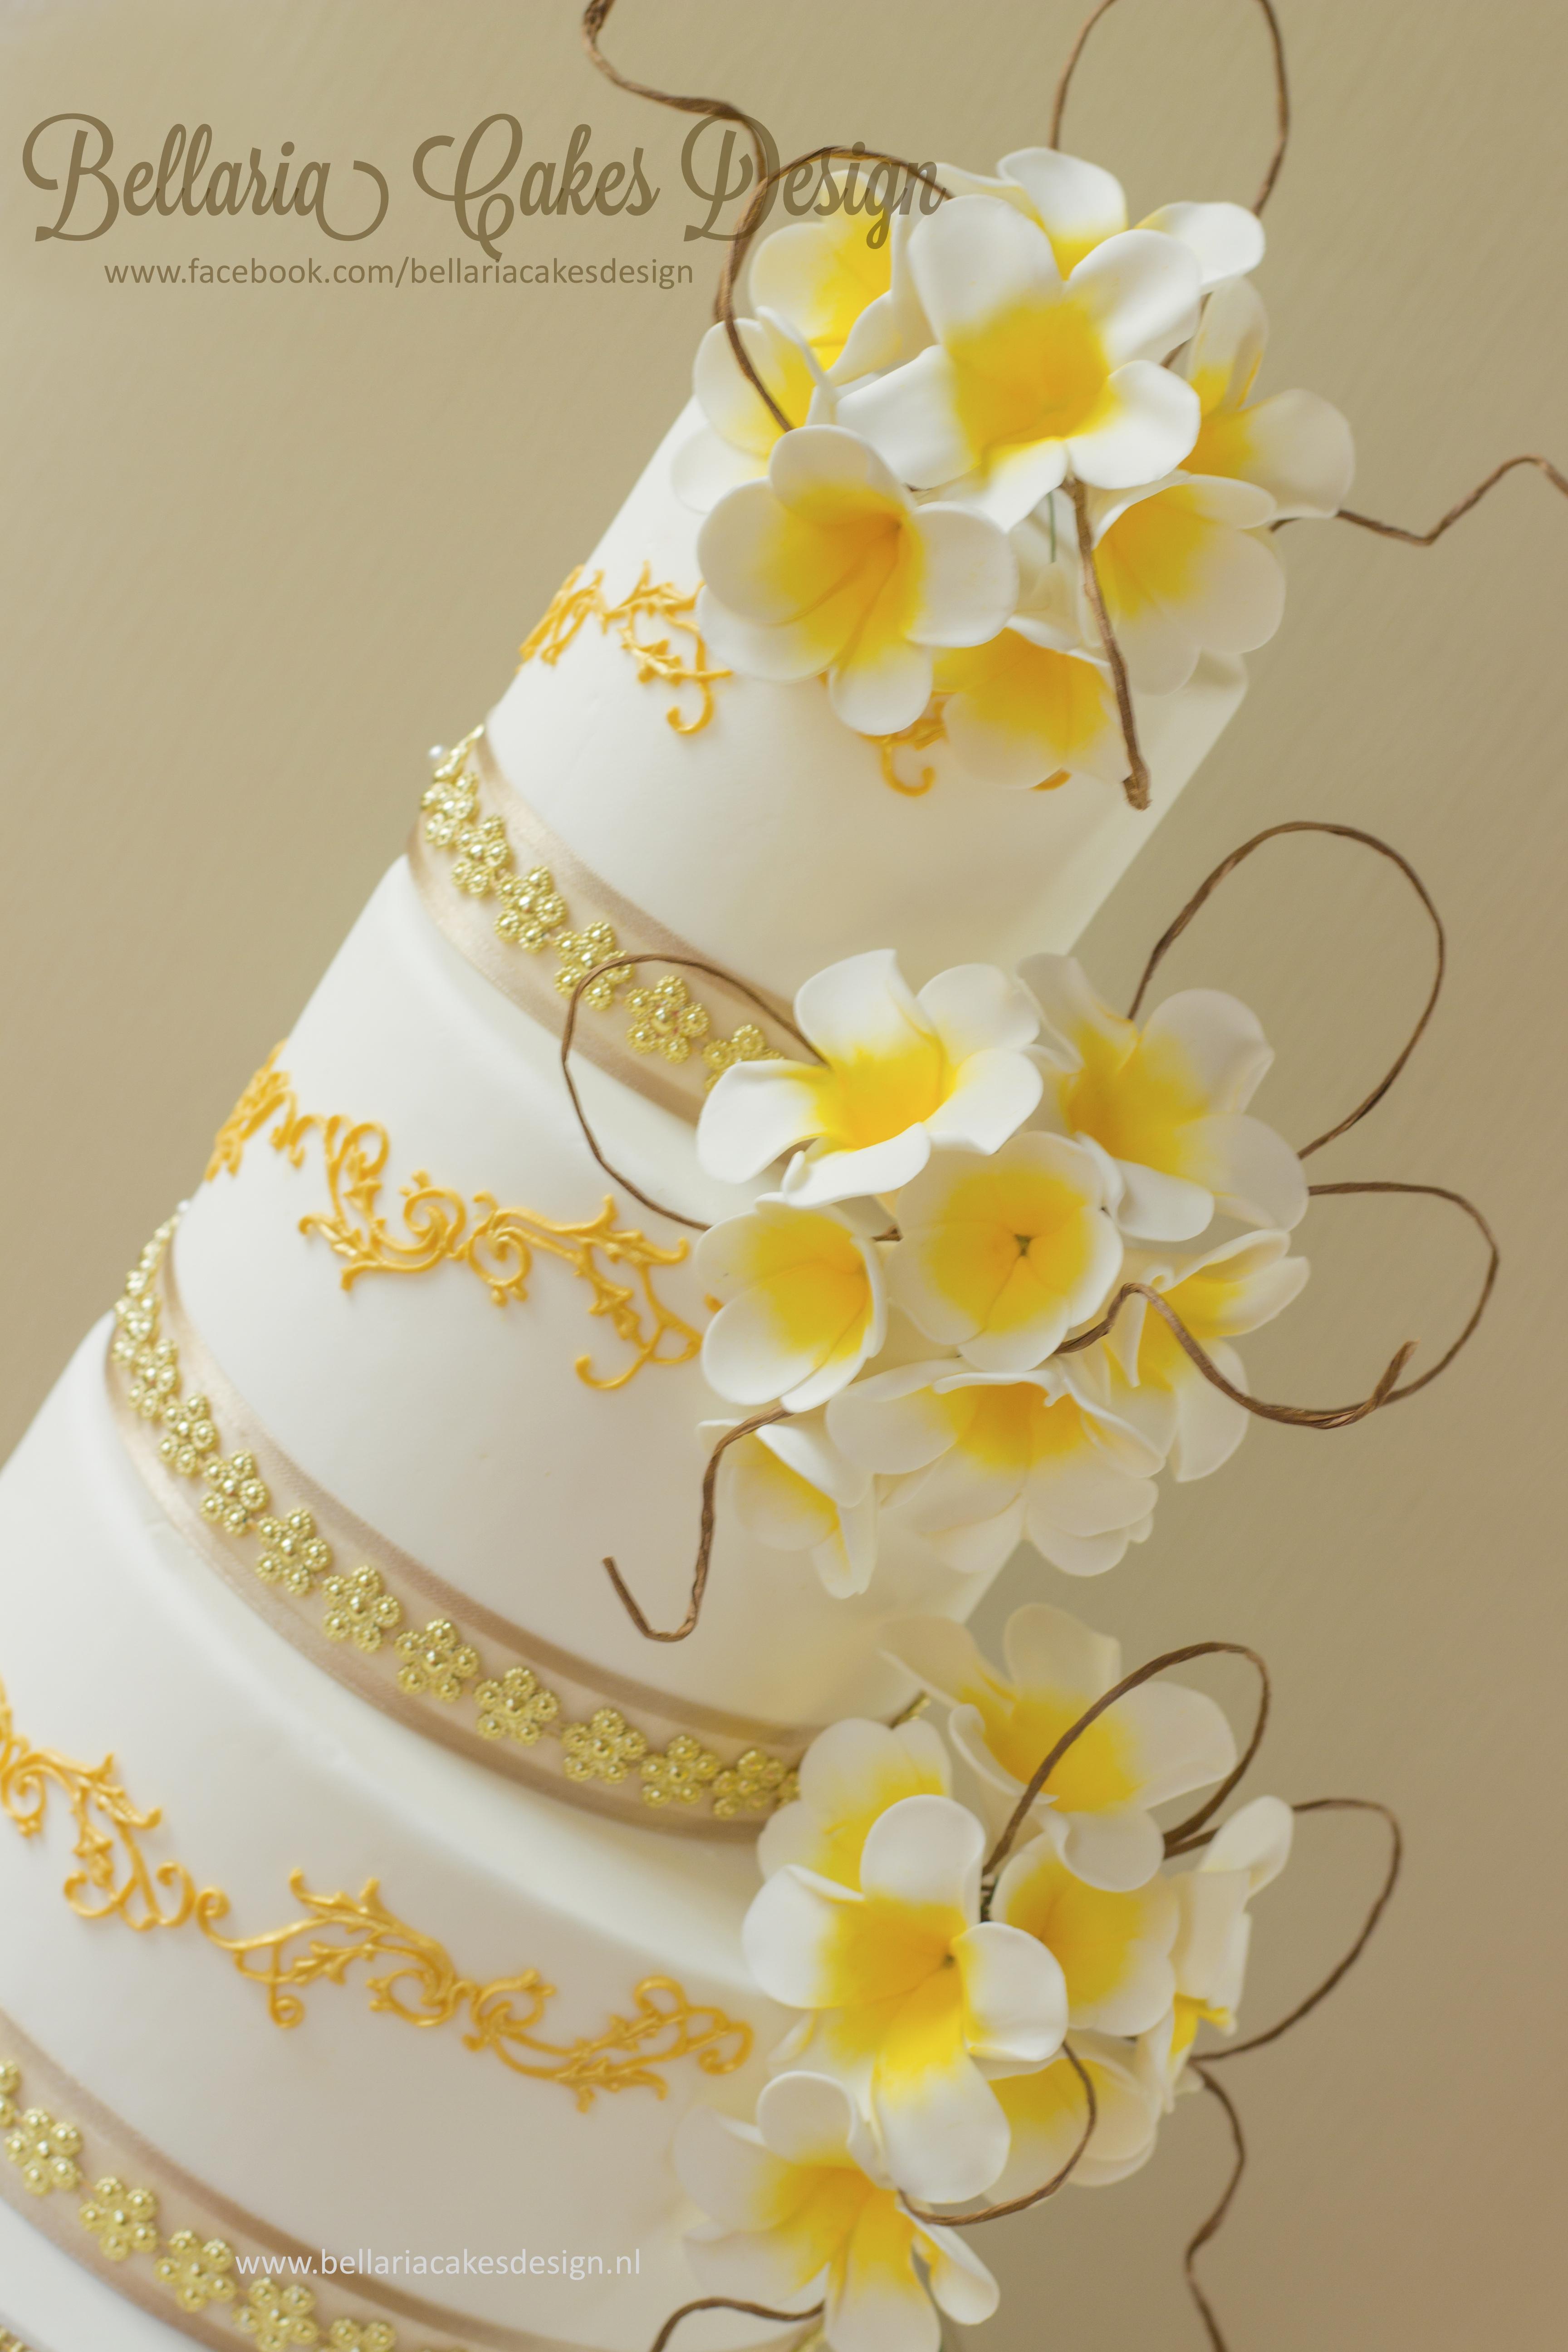 Bali Themed Wedding Cake - CakeCentral.com